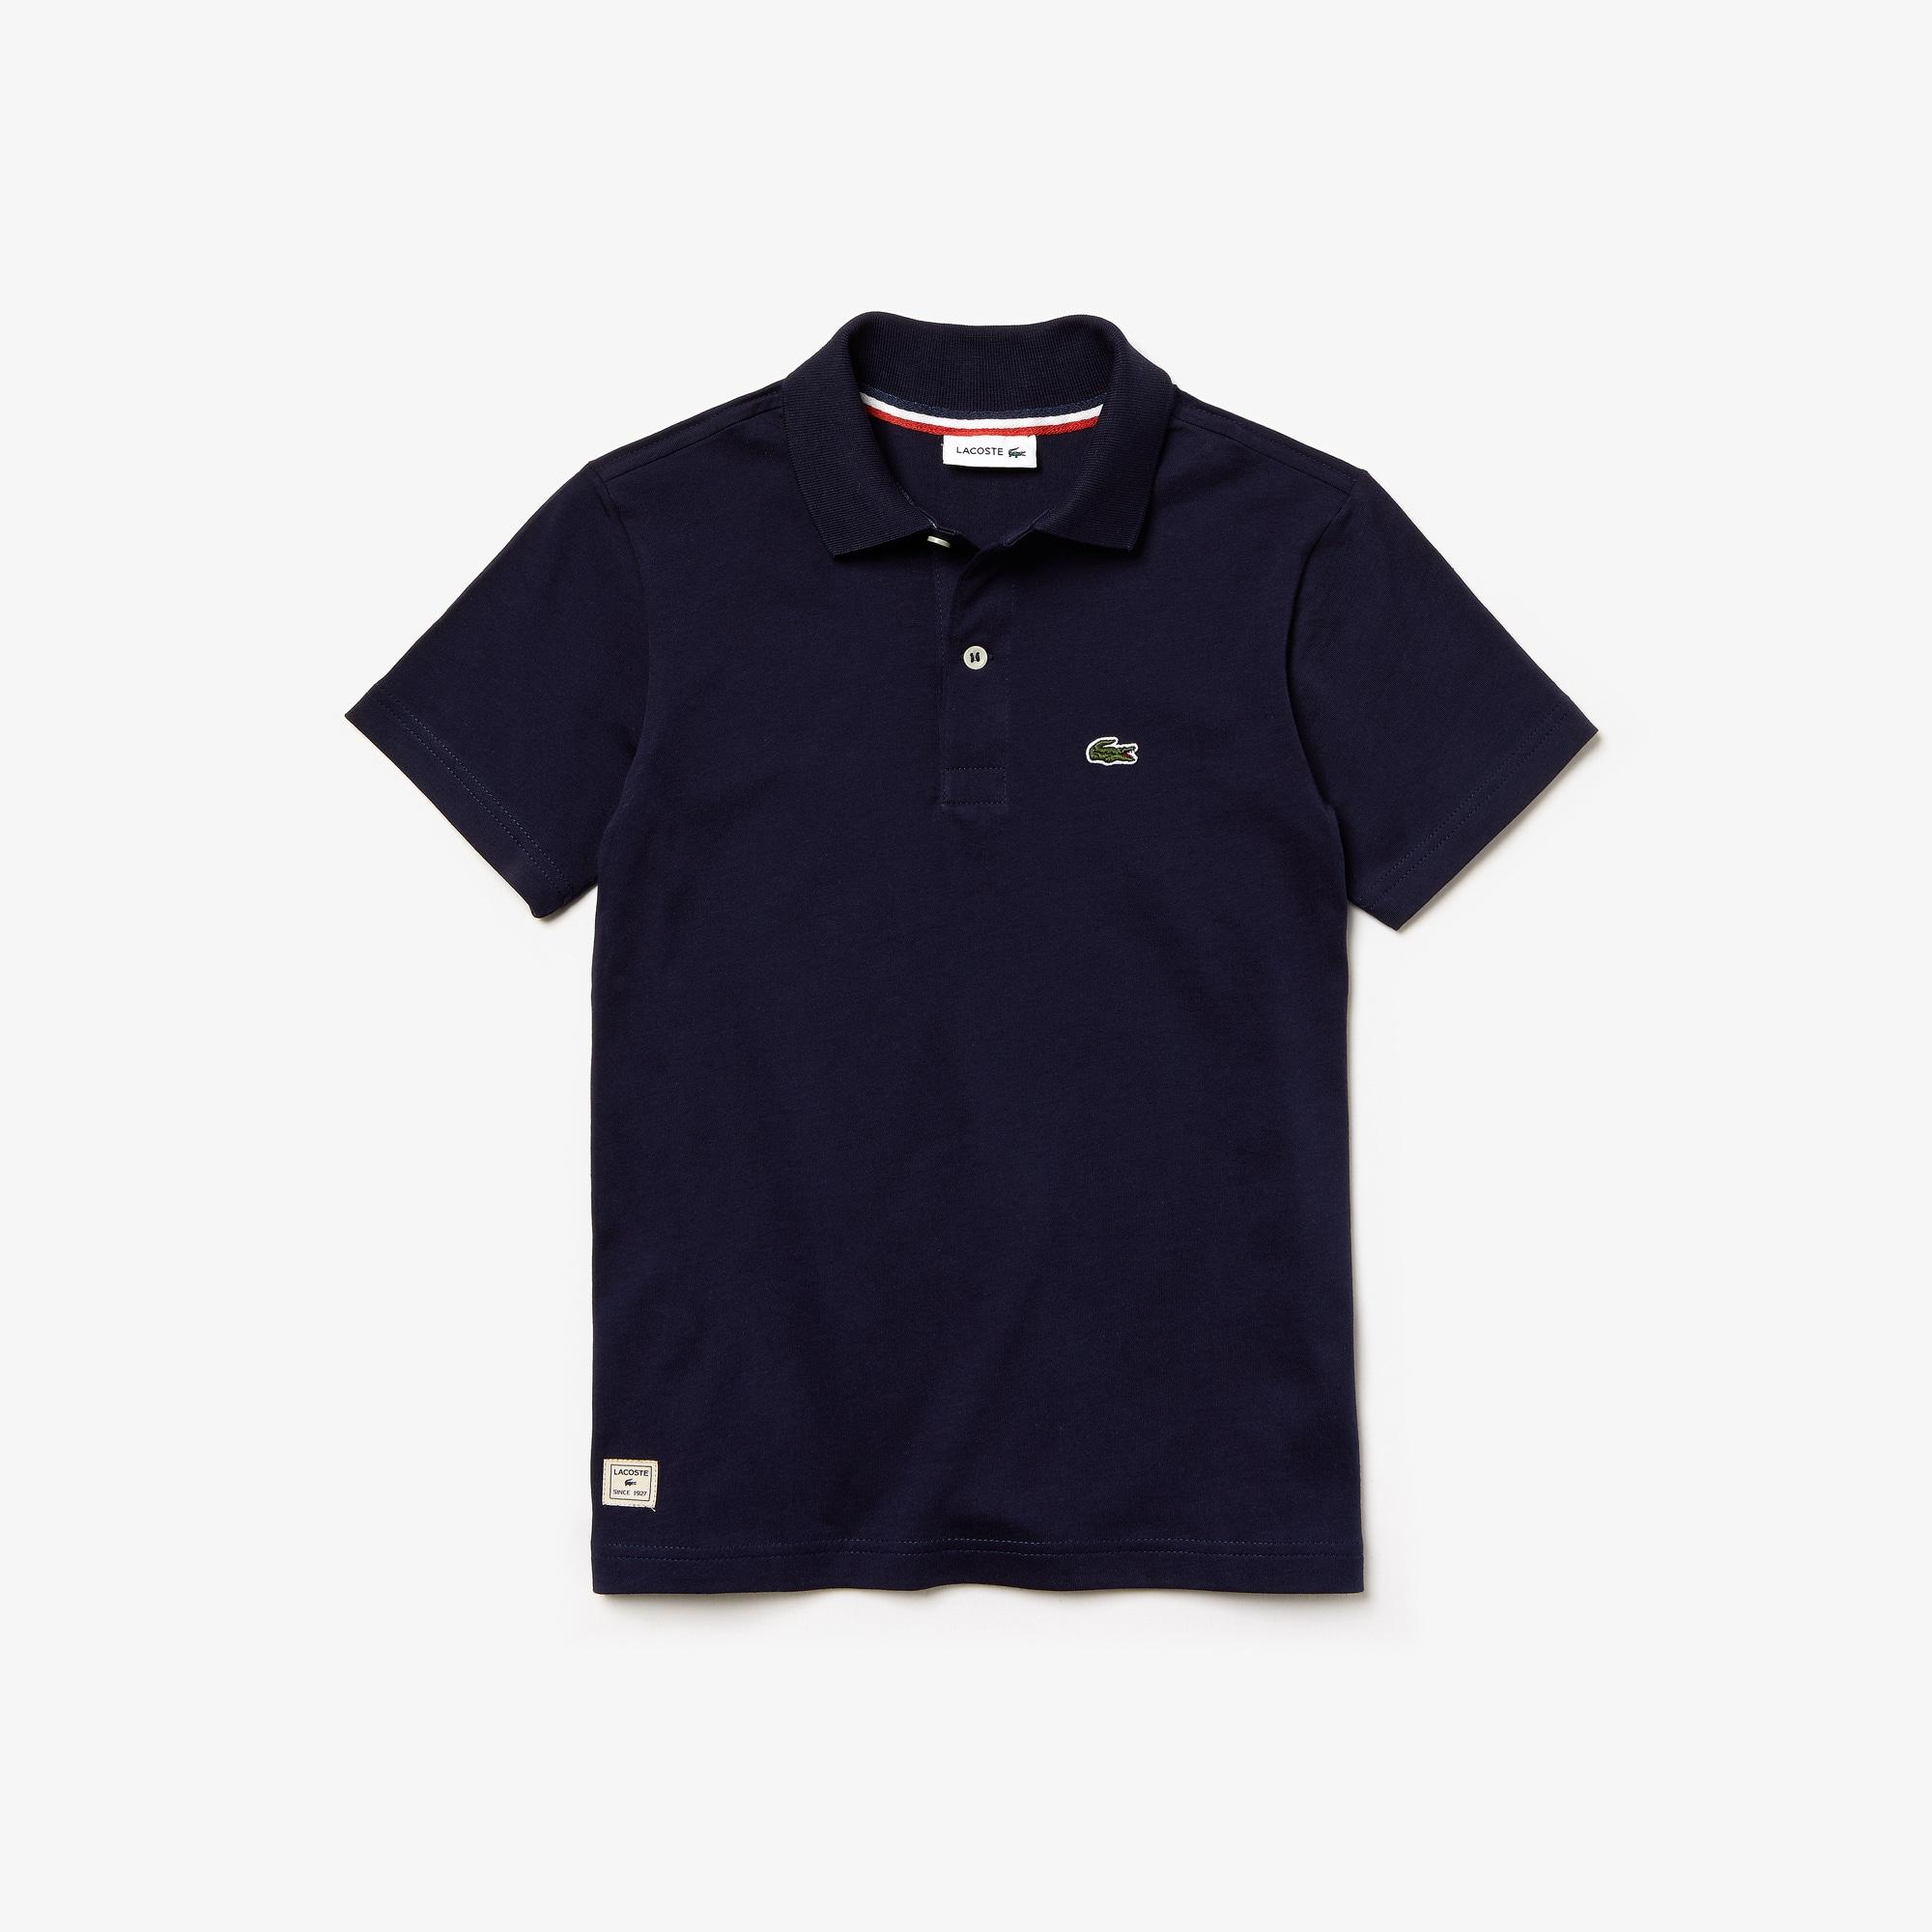 115090a784b Polo shirts